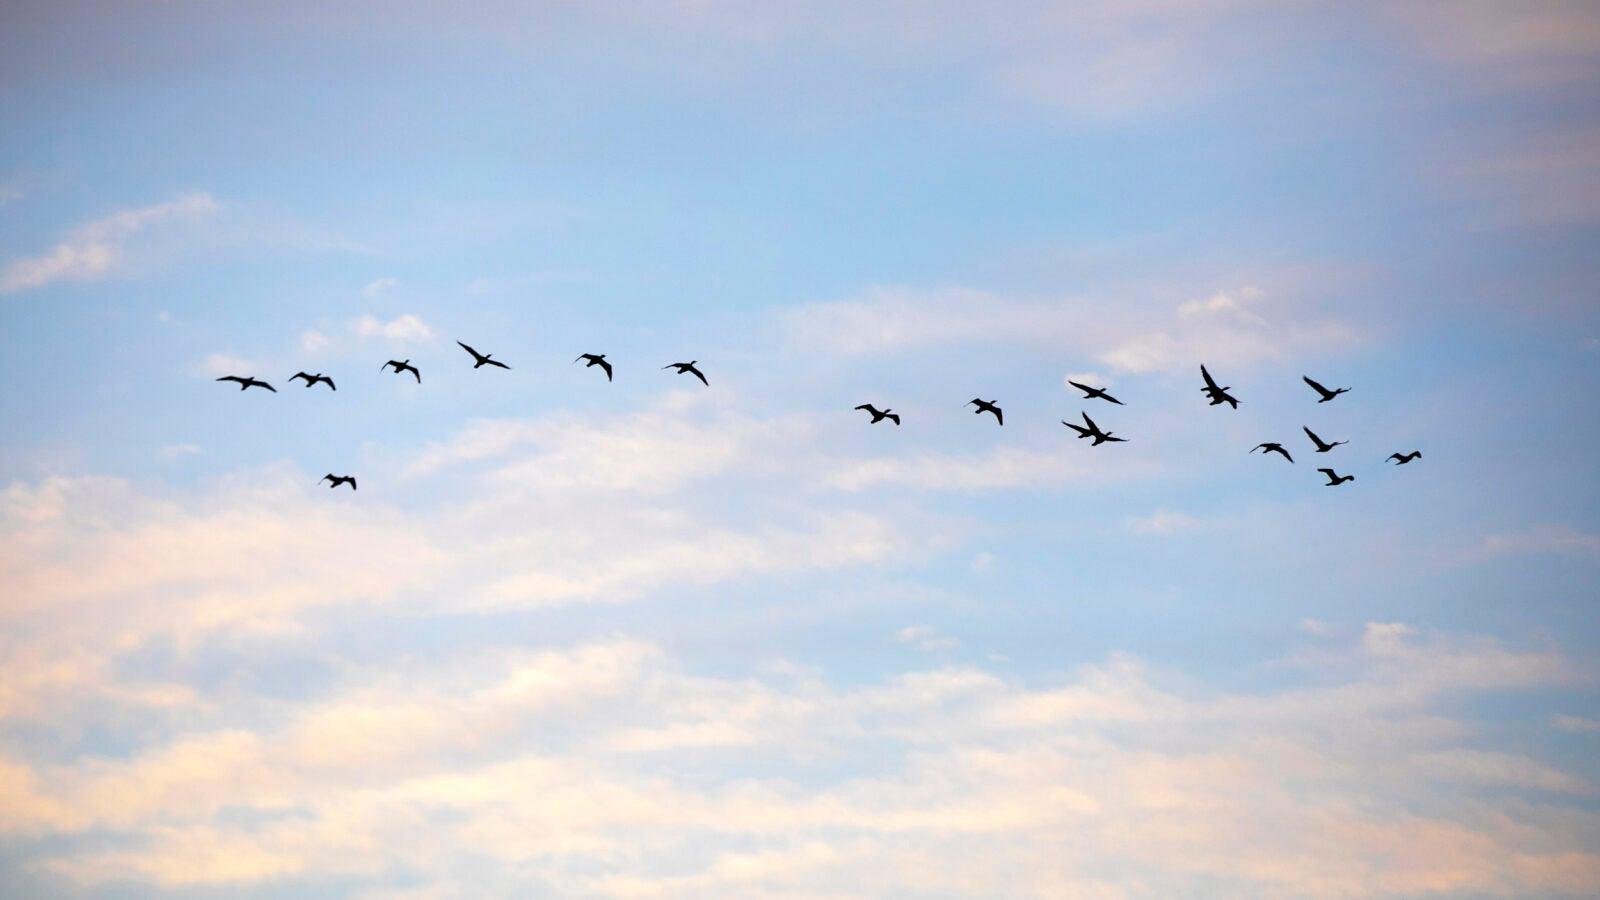 Cormorants fly across the morning sky.